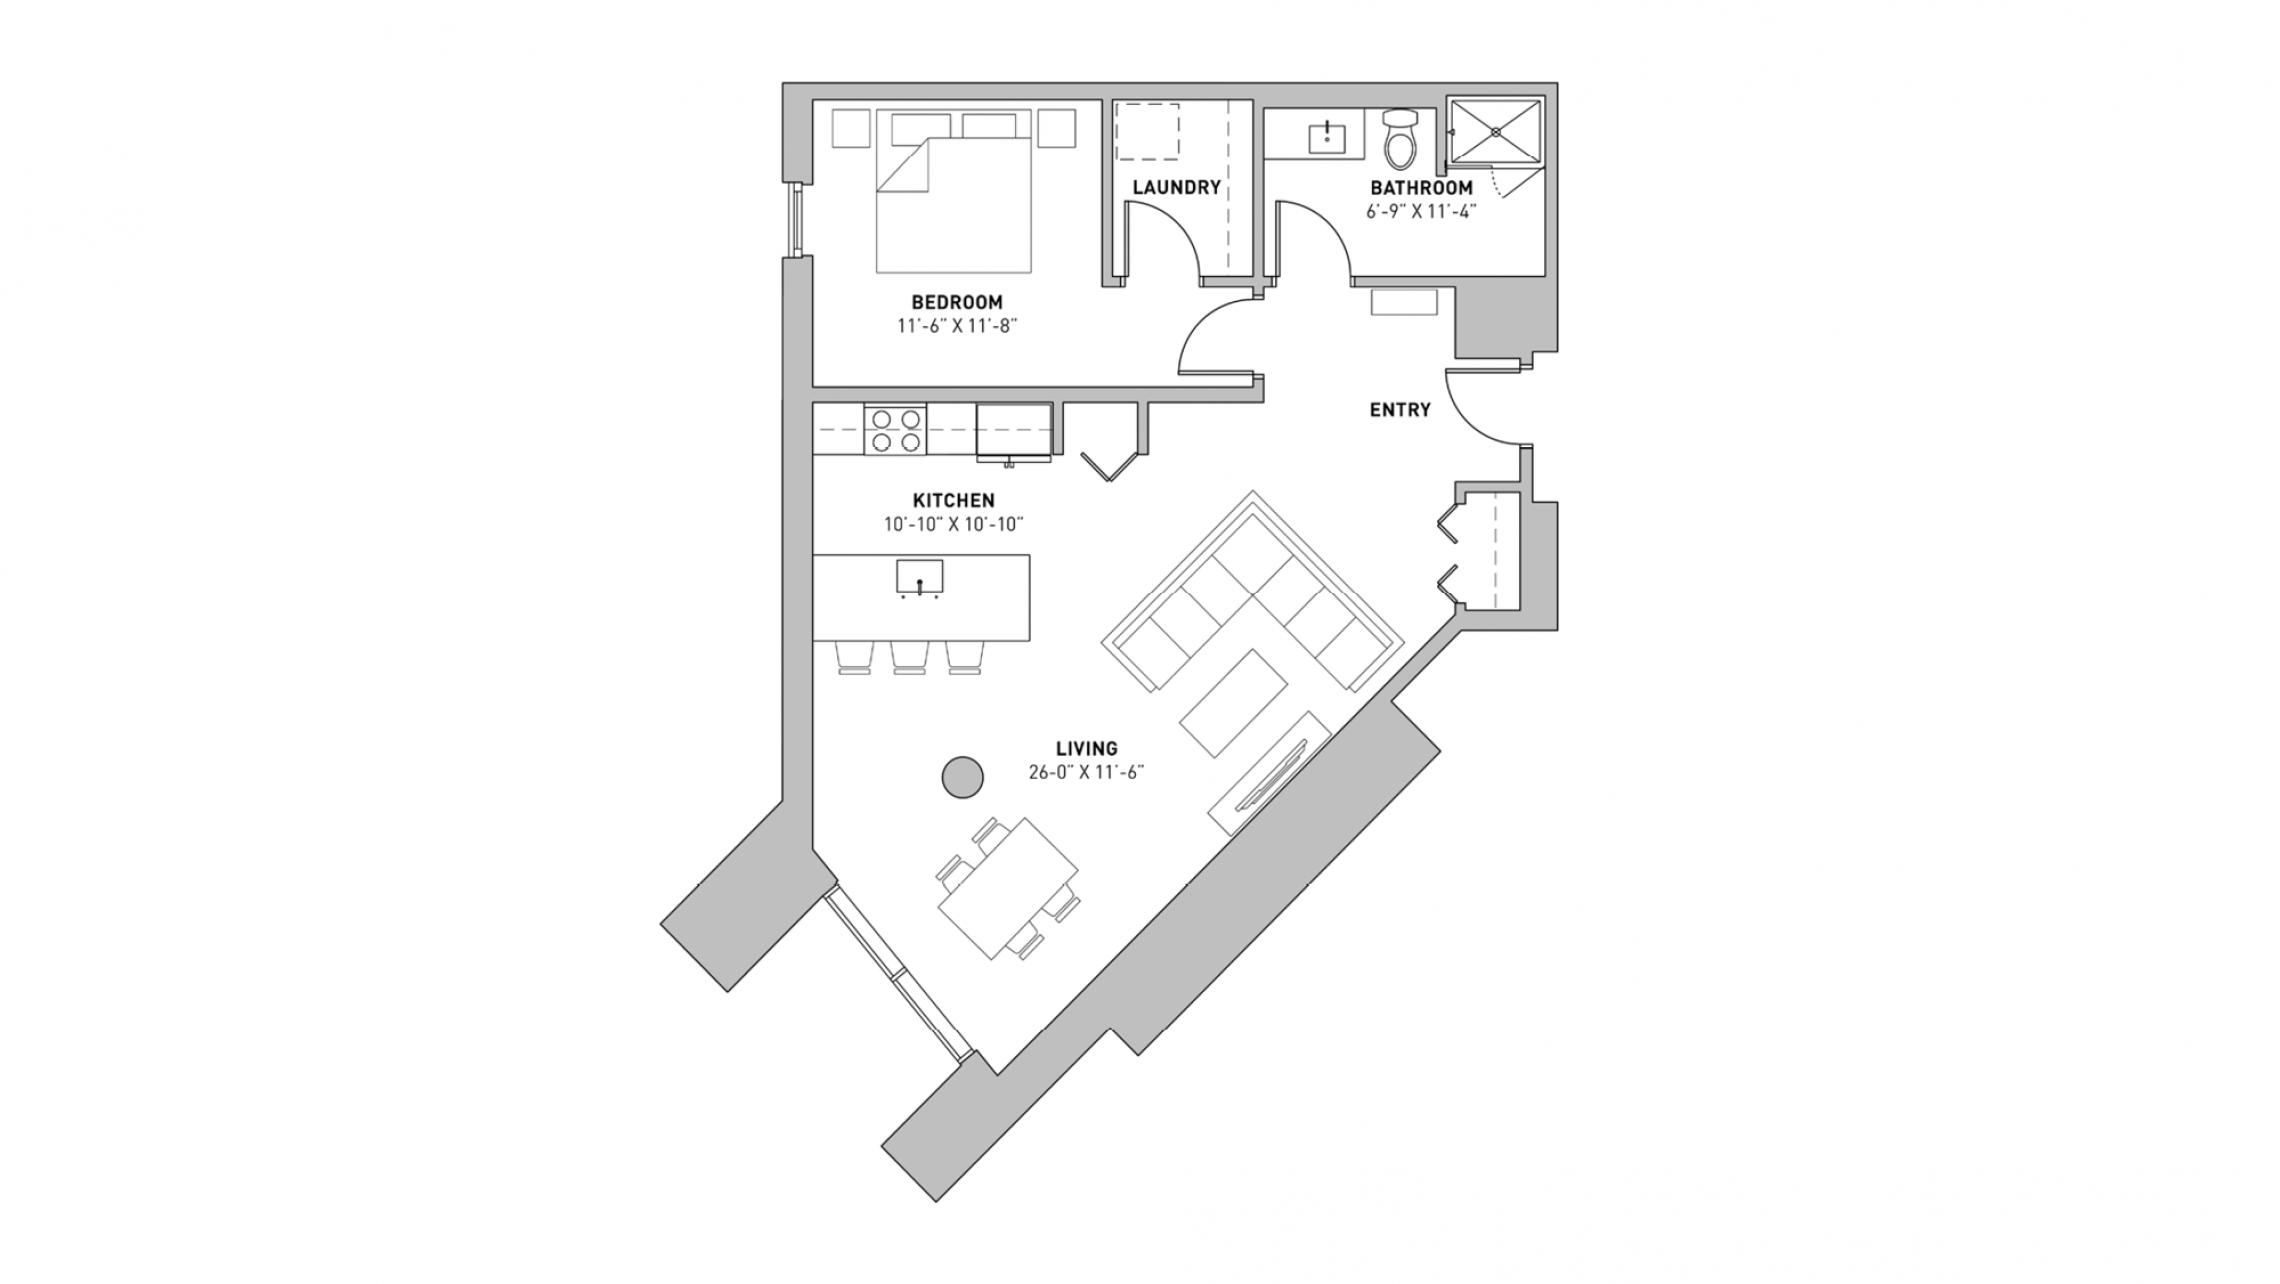 ULI The Pressman 221 - One Bedroom, One Bathroom